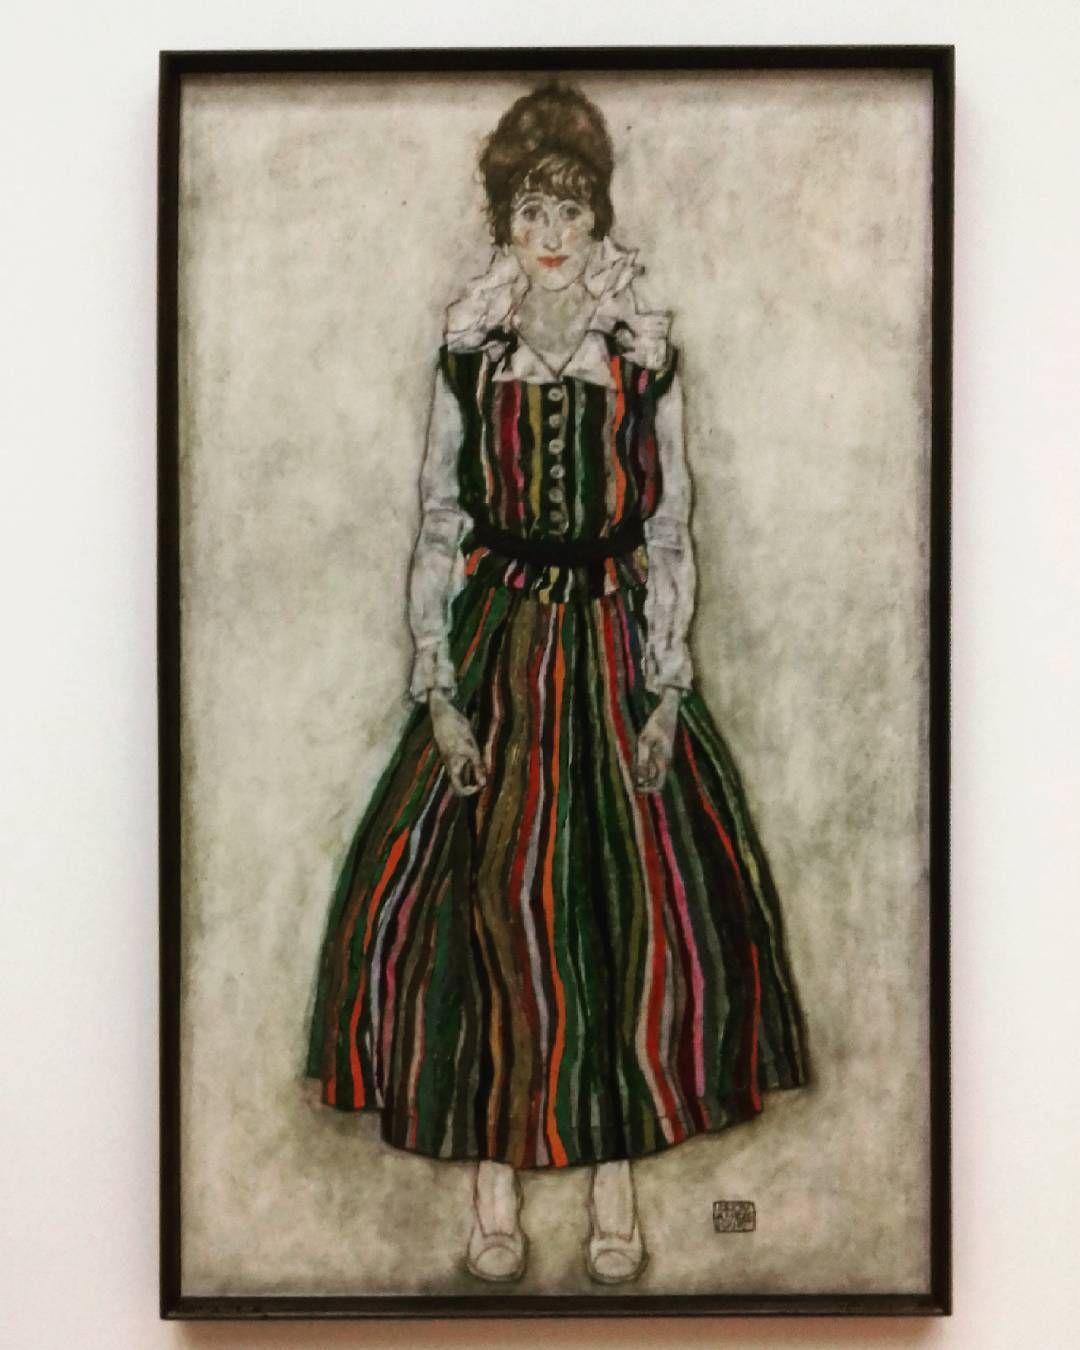 What an awesome surprise seeing my first Egon Schiele !!! #art #holland #artist #paint #dress #rotterdamart #orignal #paintings